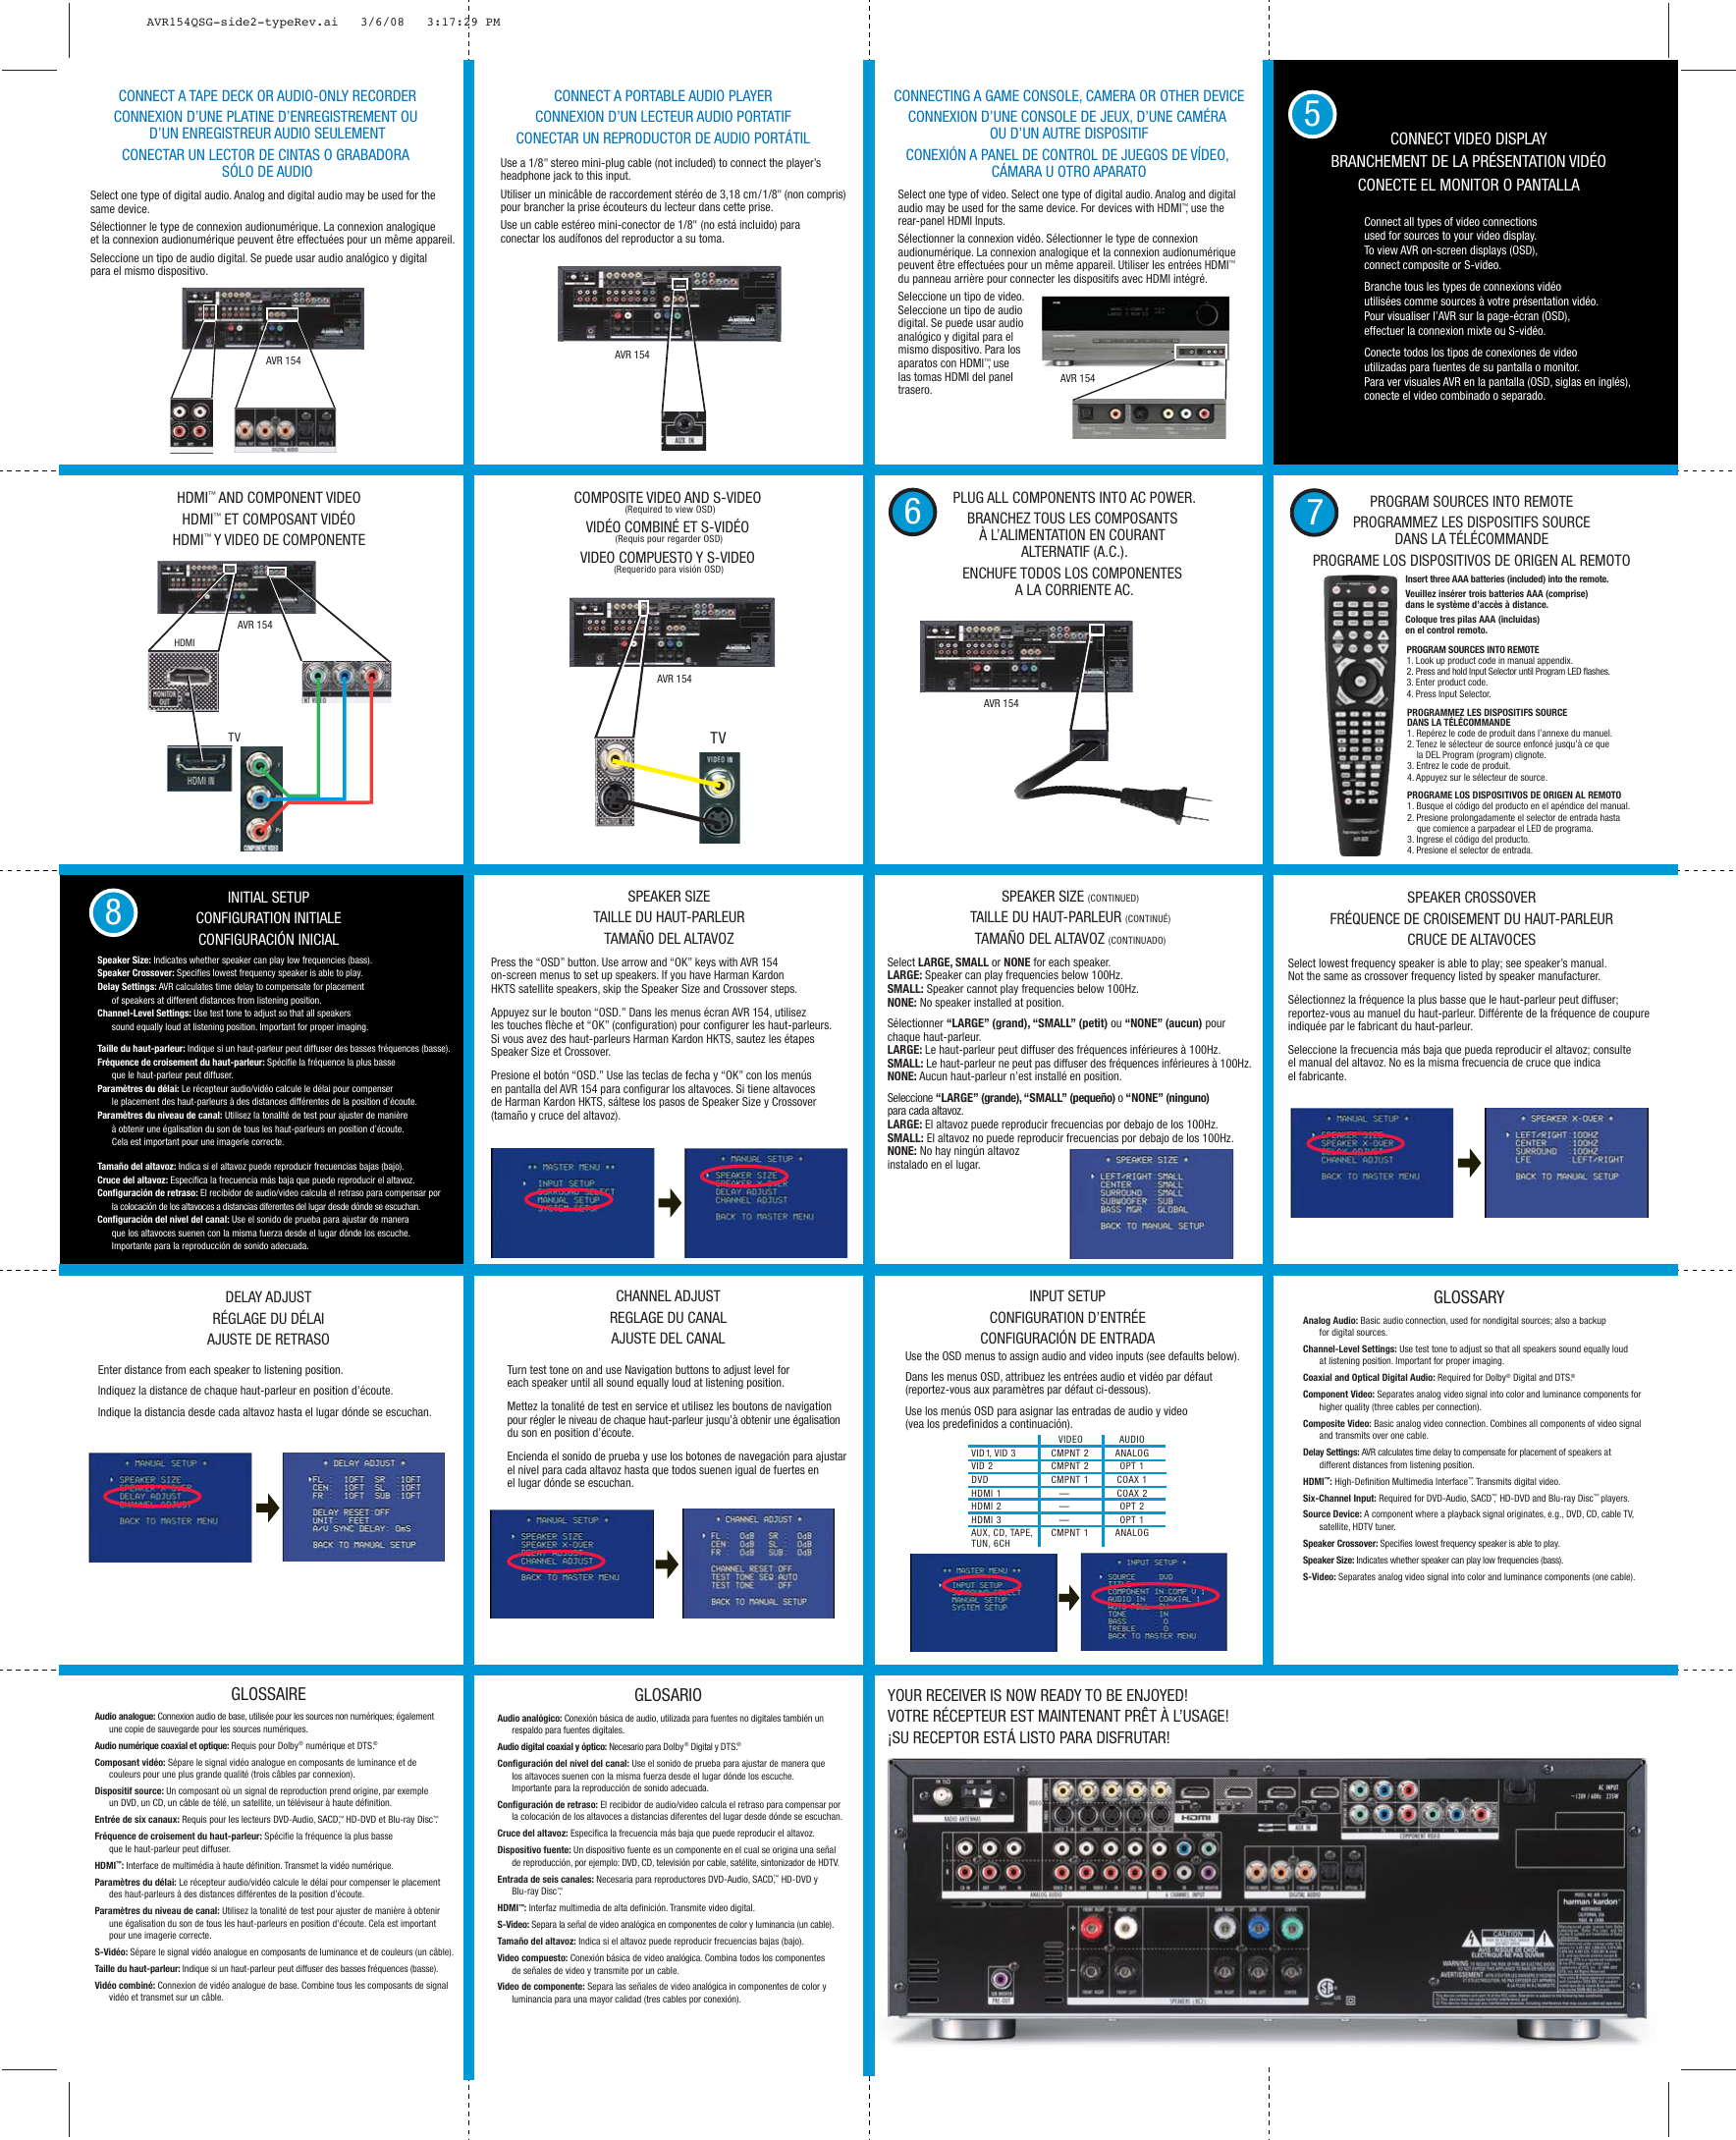 Harman Kardon Avr 154 Users Manual AVR154QSG side2 typeRev